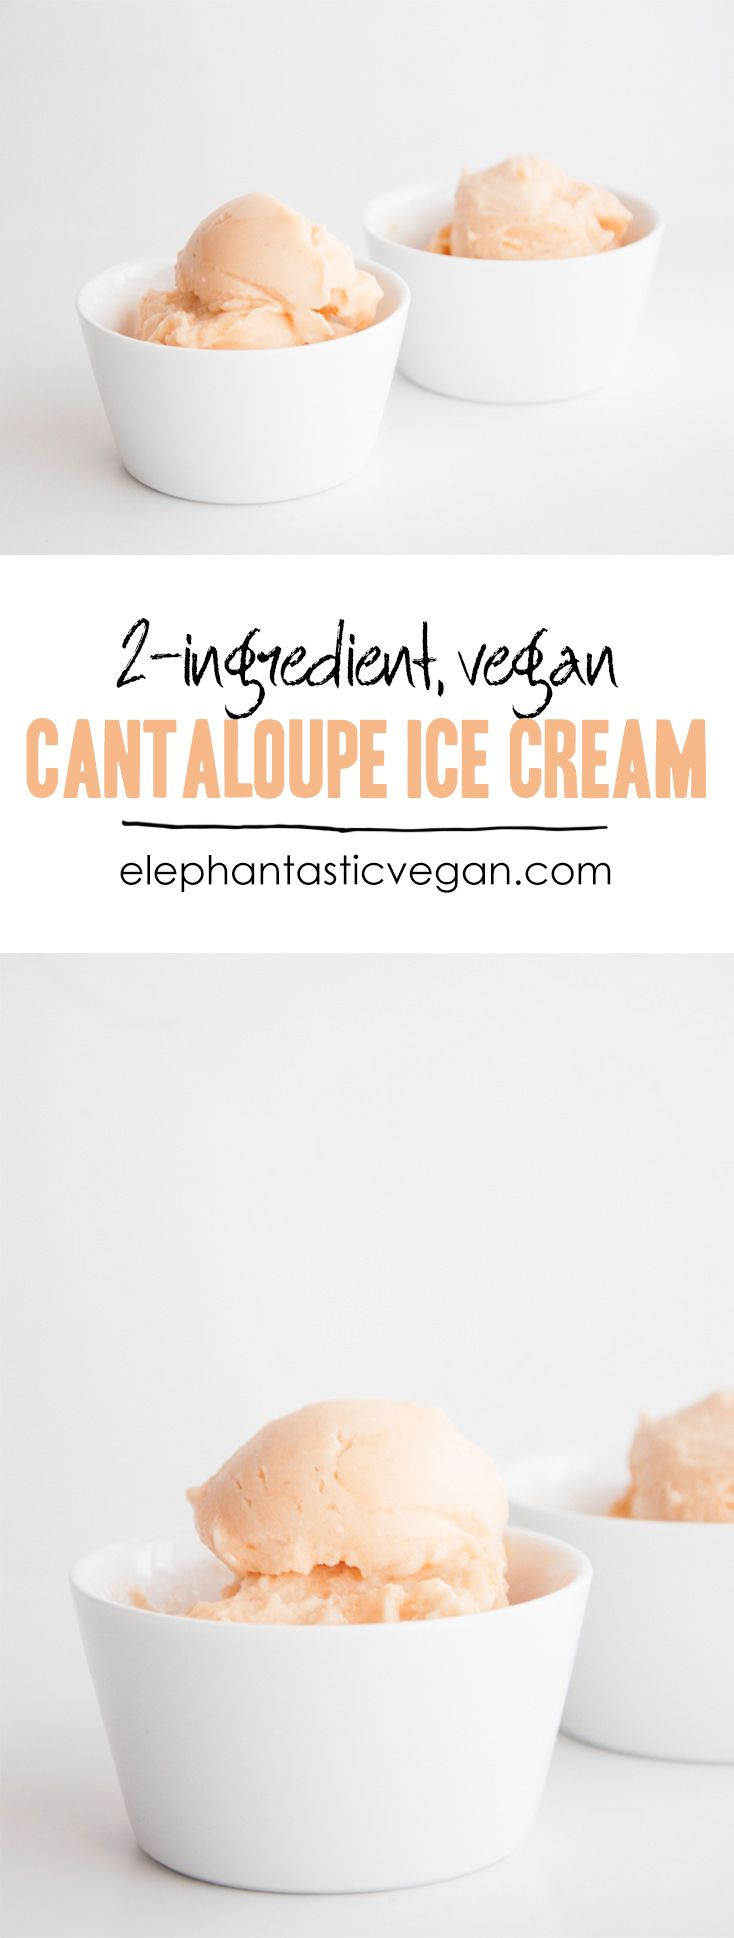 Vegan 2-Ingredient Cantaloupe Ice Cream | ElephantasticVegan.com